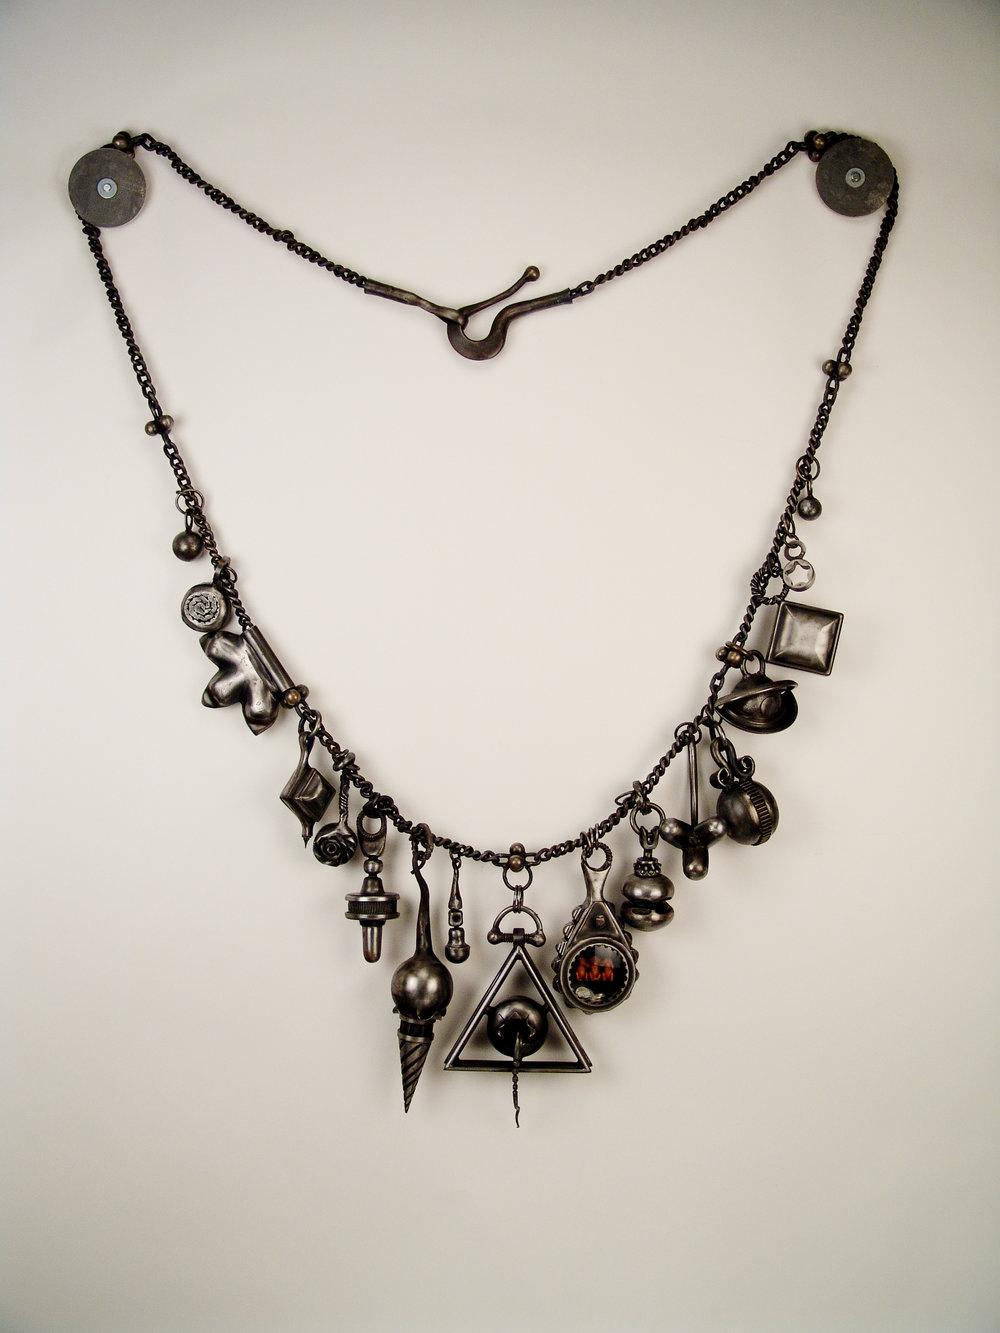 necklace01.JPG